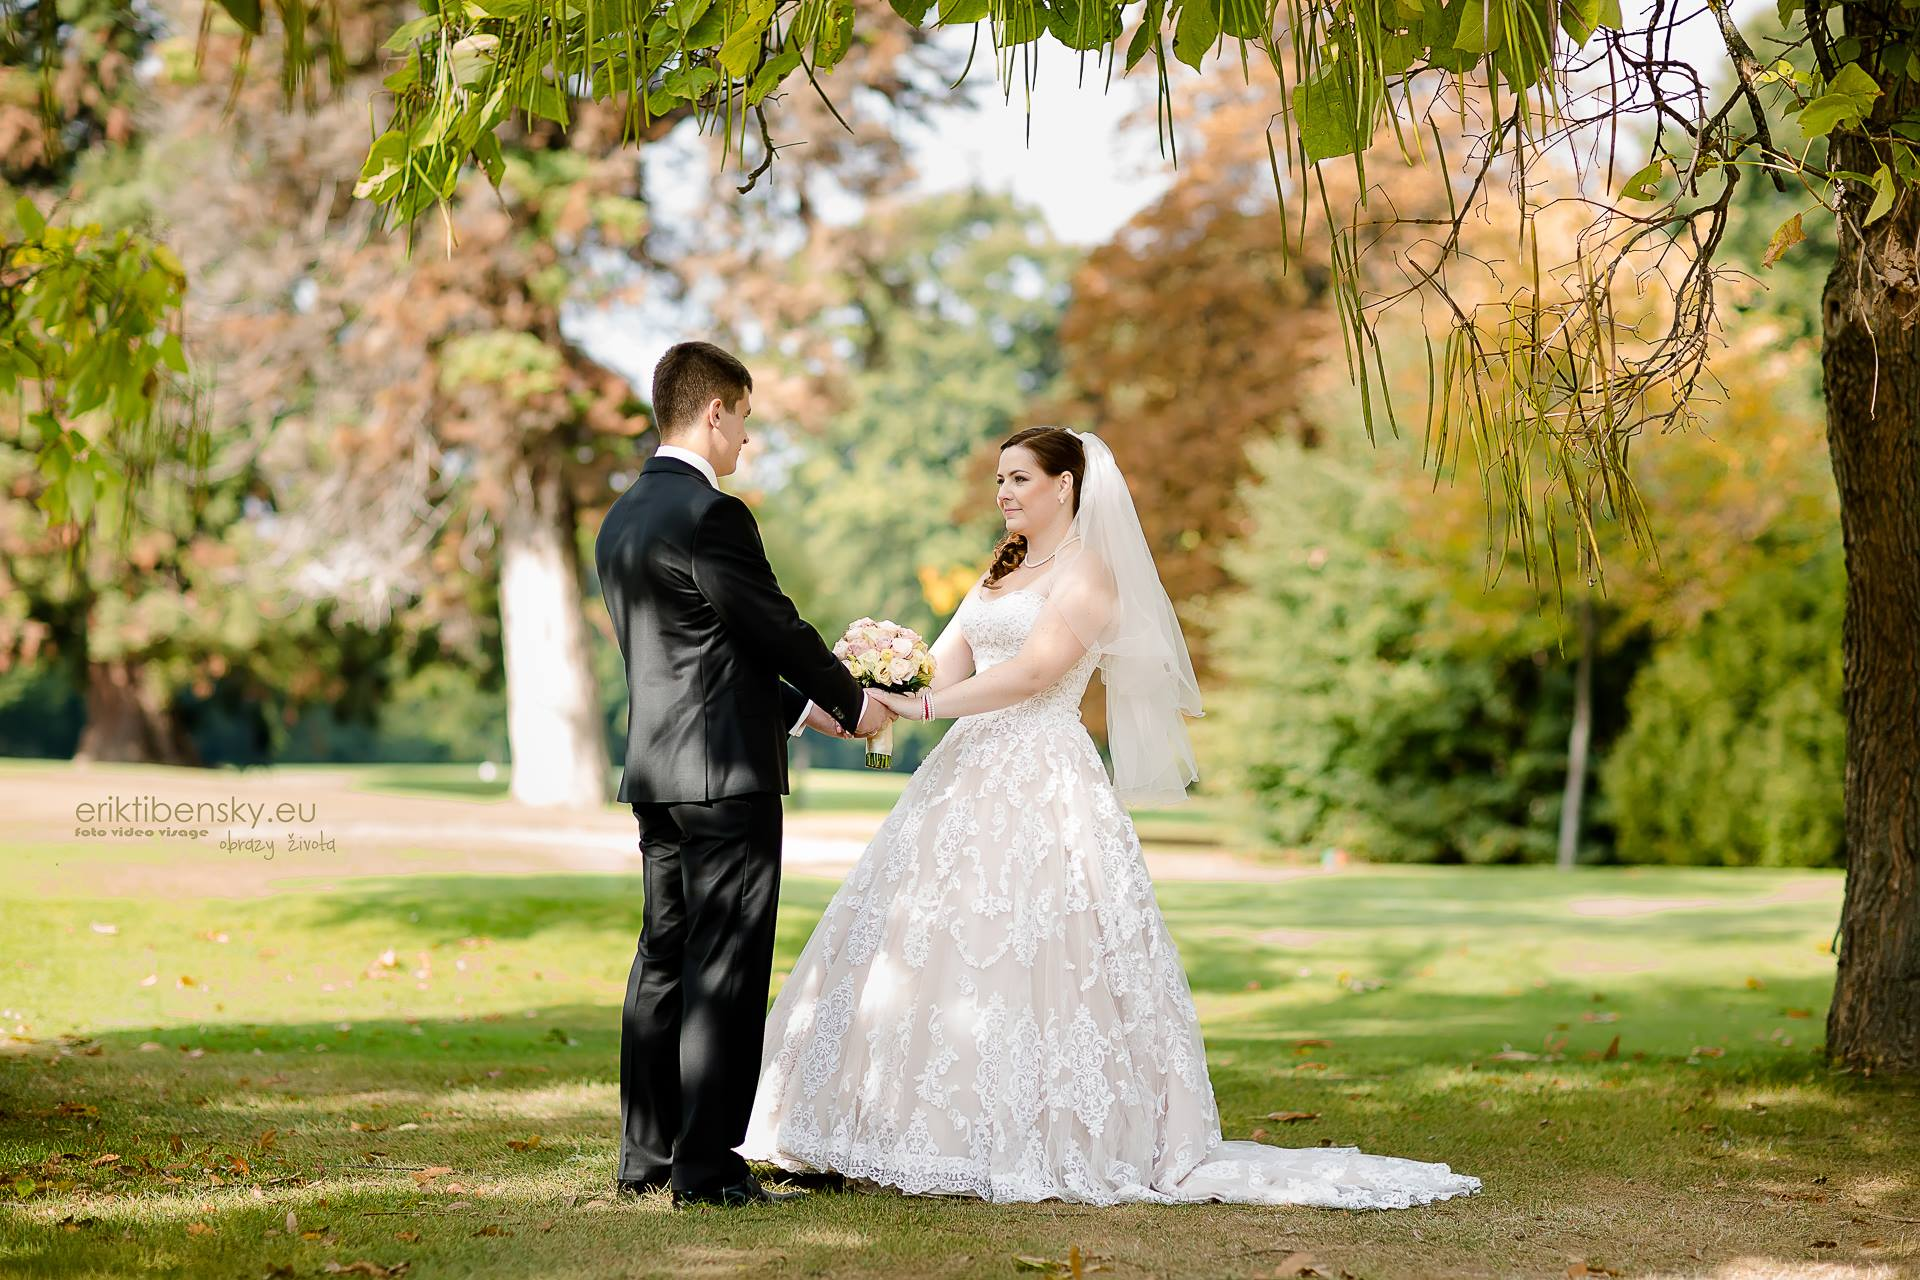 eriktibensky-eu-svadobny-fotograf-wedding-photographer-3080